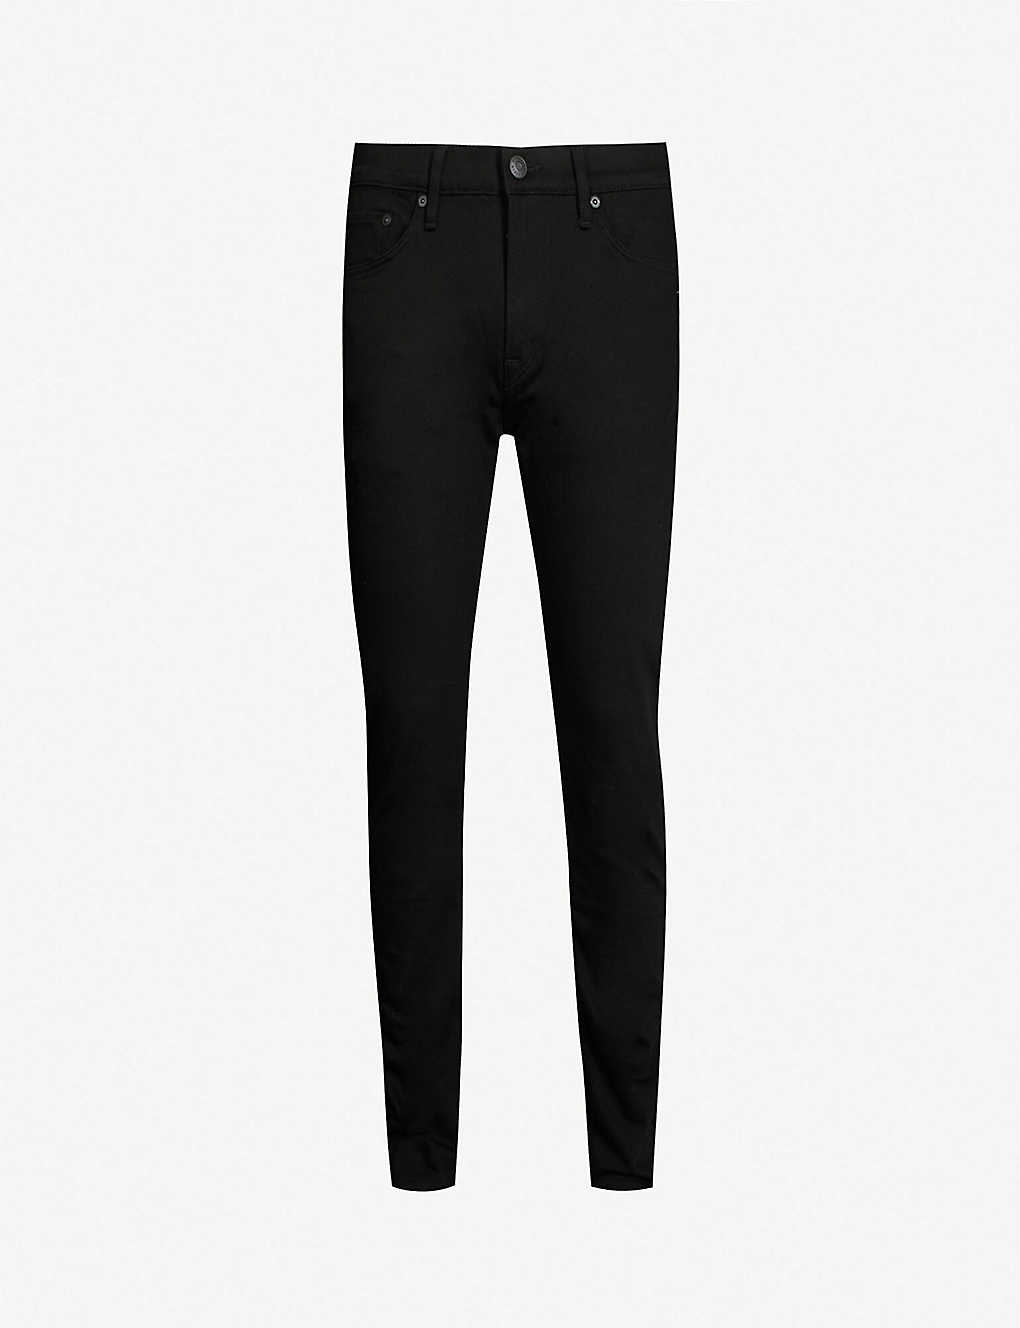 2ff65d5a BURBERRY - Slim-fit tapered stretch-denim jeans | Selfridges.com